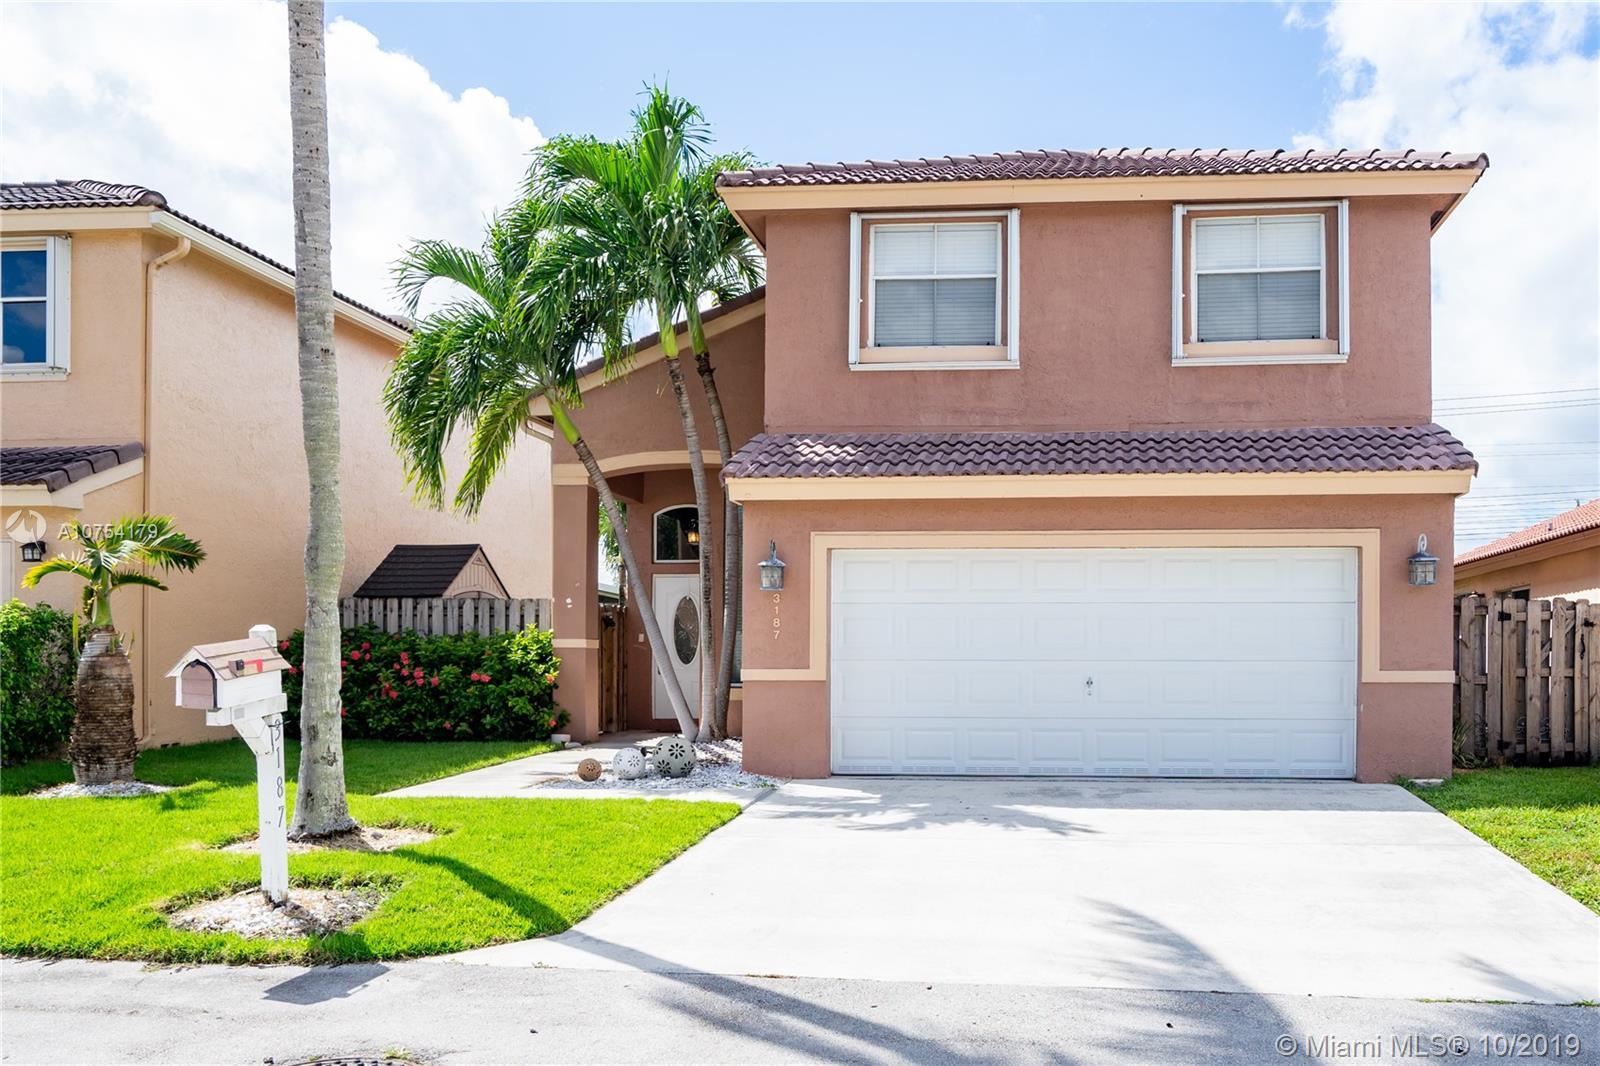 3187 W Buena Vista Dr, Margate, FL 33063